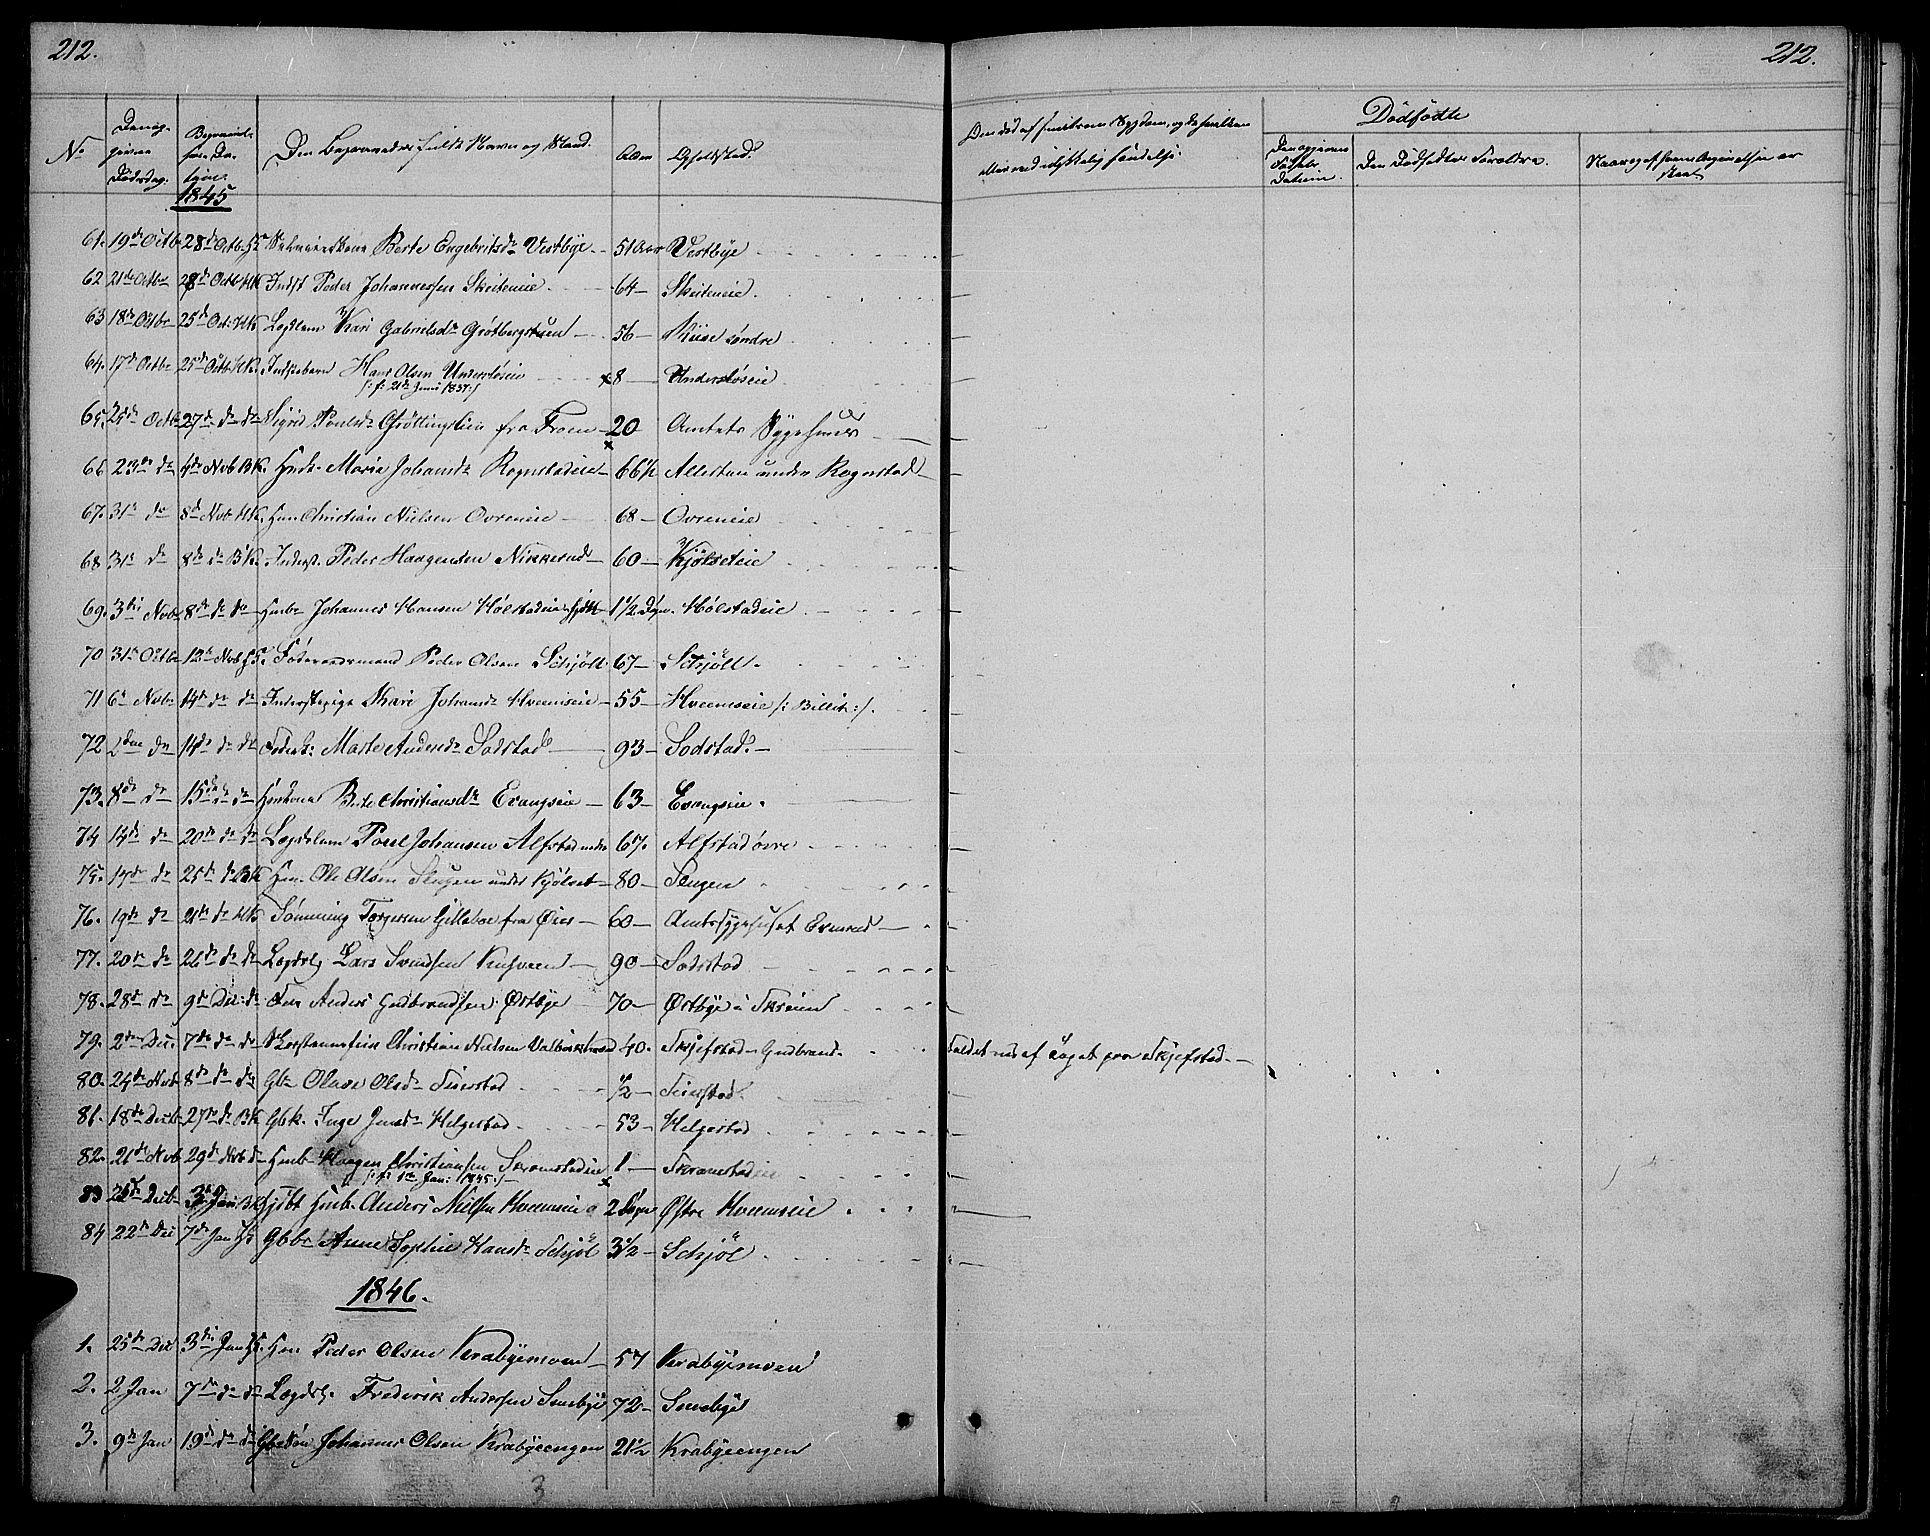 SAH, Østre Toten prestekontor, Klokkerbok nr. 2, 1840-1847, s. 212